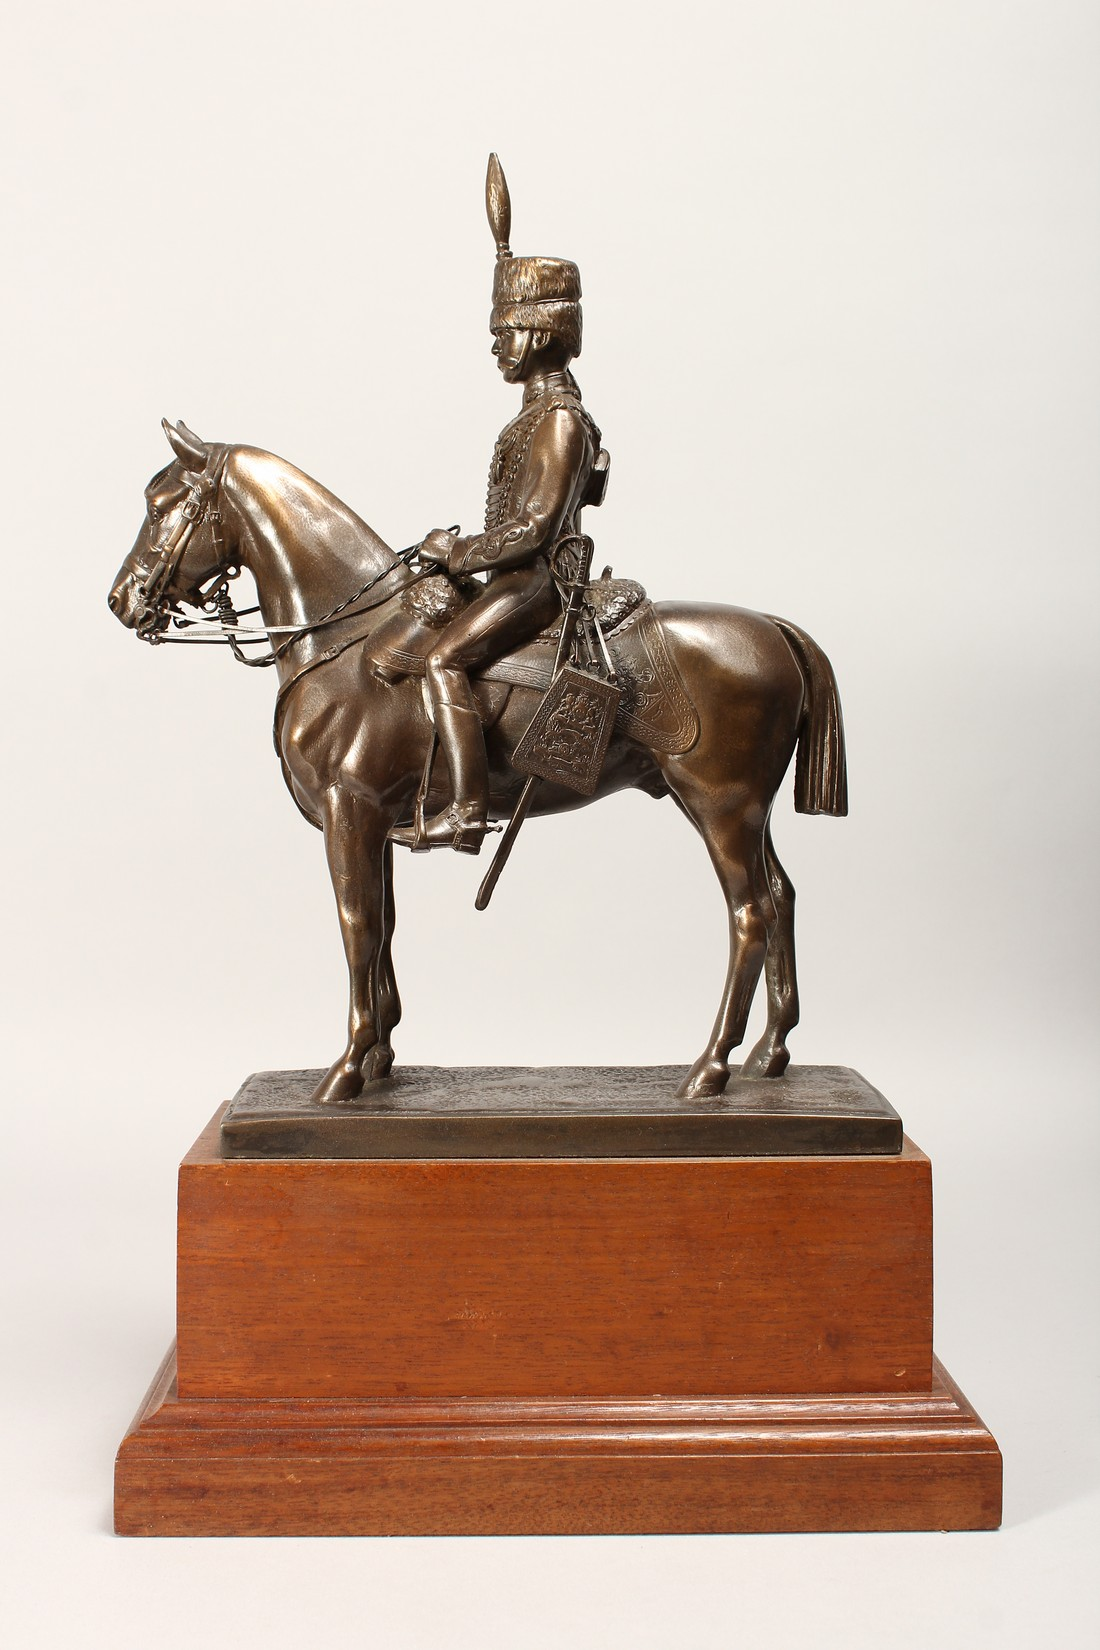 A BRONZE OVERLAID COMPOSITE MODEL OF A HUSSAR ON HORSEBACK, on a wooden plinth base 17ins high. - Image 2 of 4